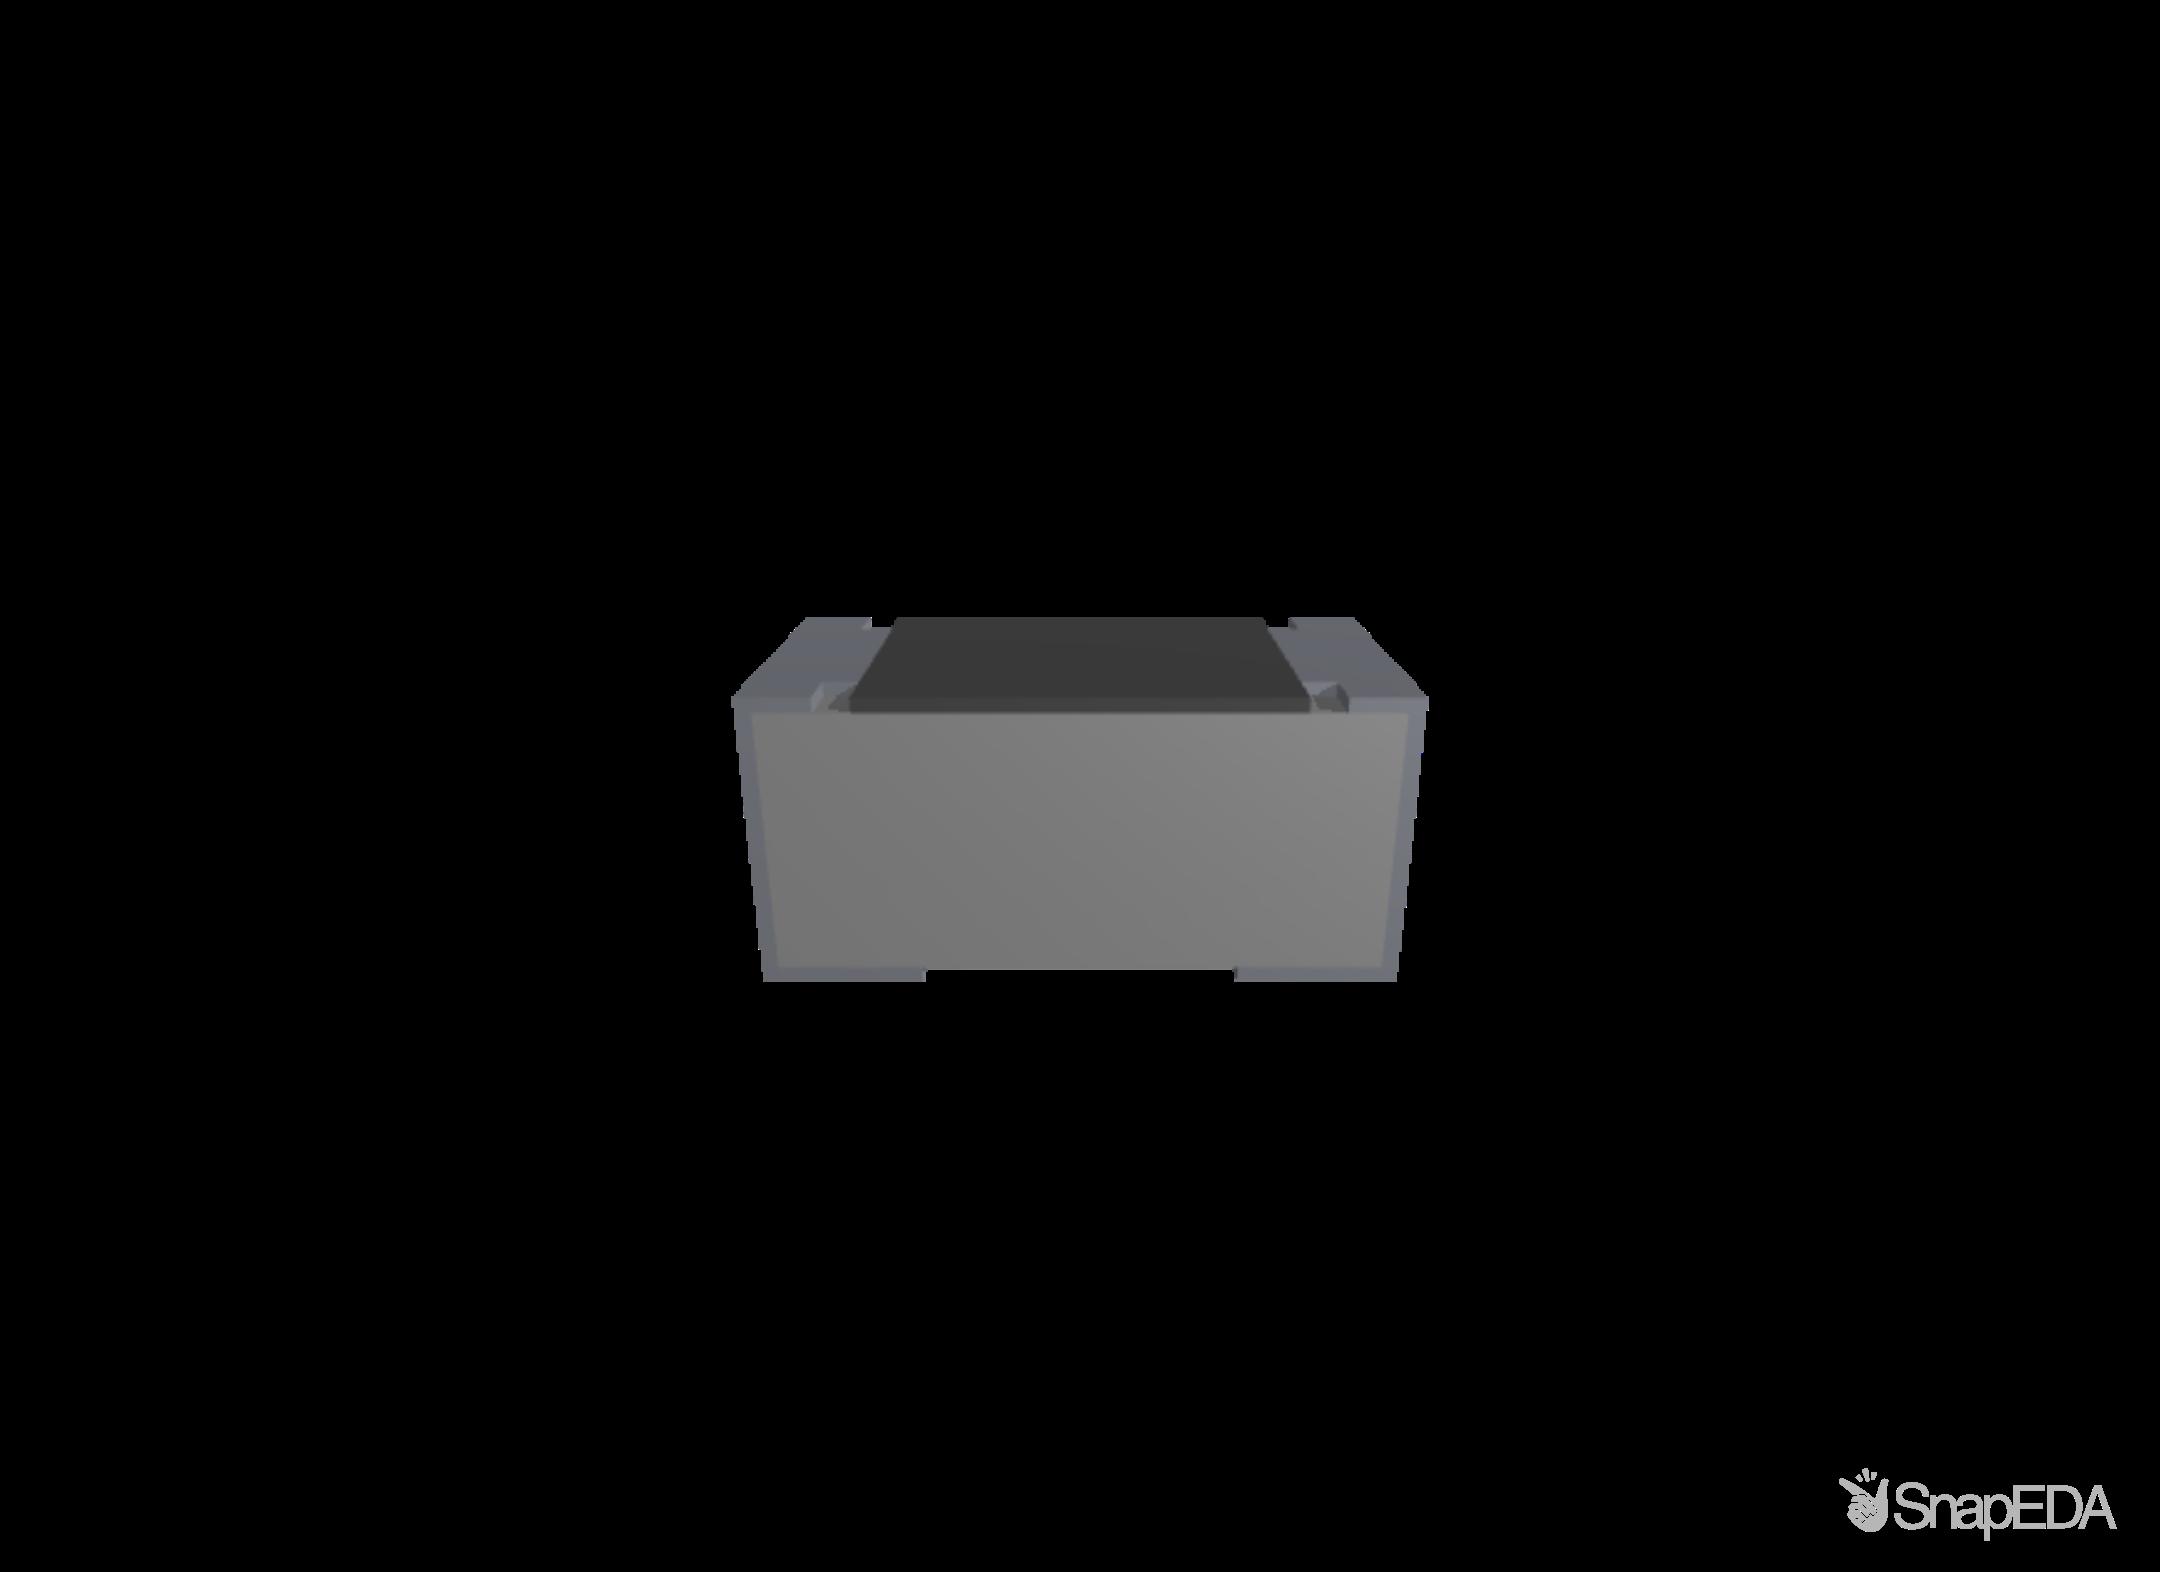 CRCW020110K0FKED 3D Model